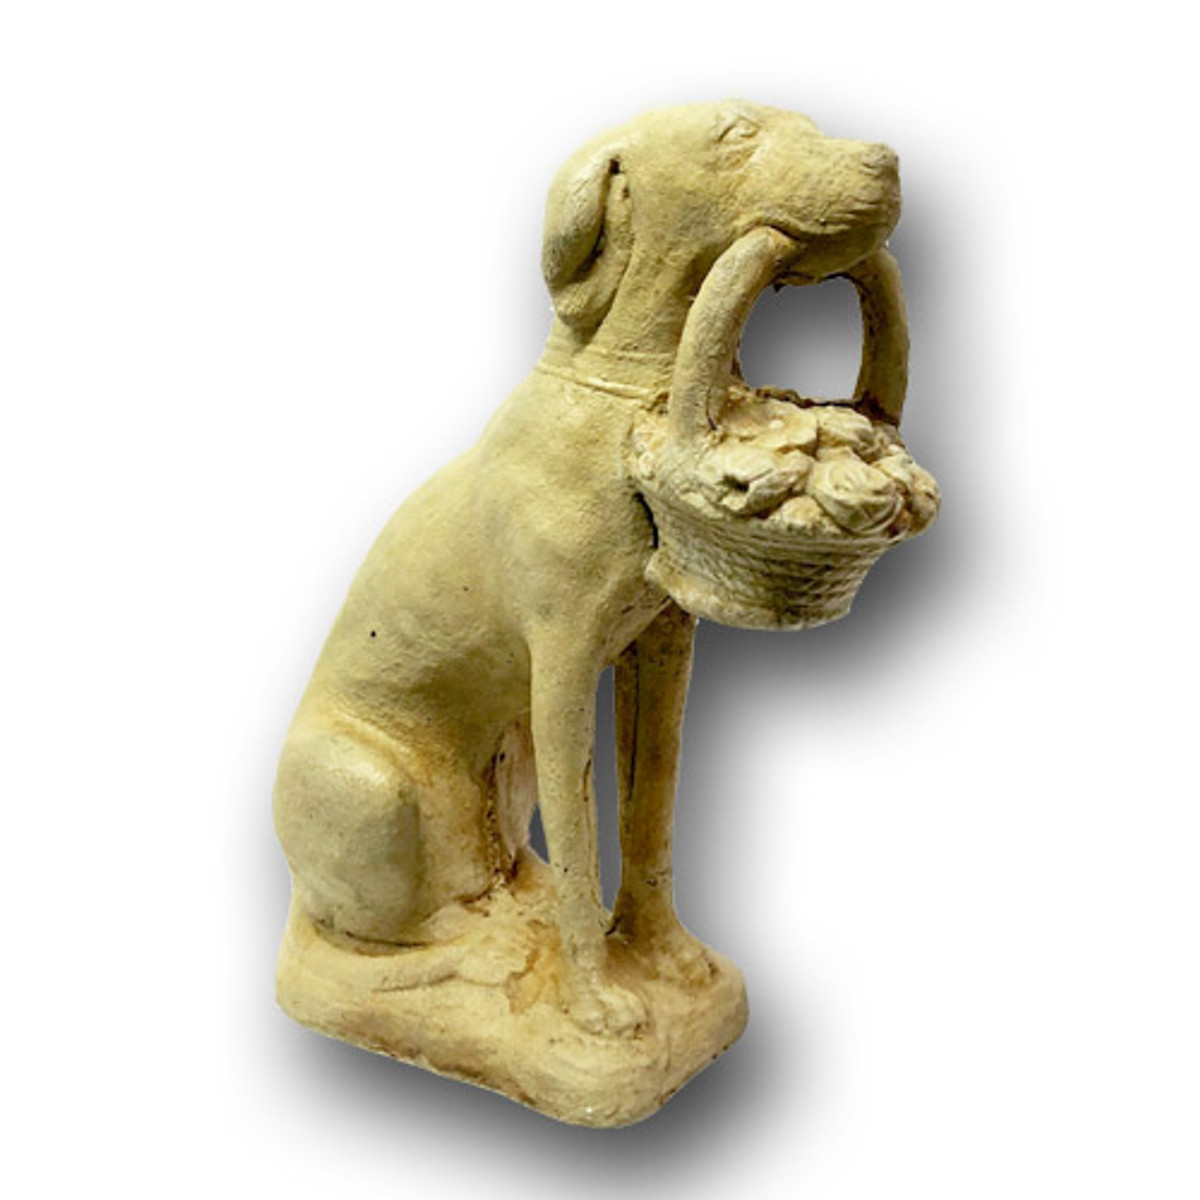 BR-016 Concrete Dog Sculpture with basket